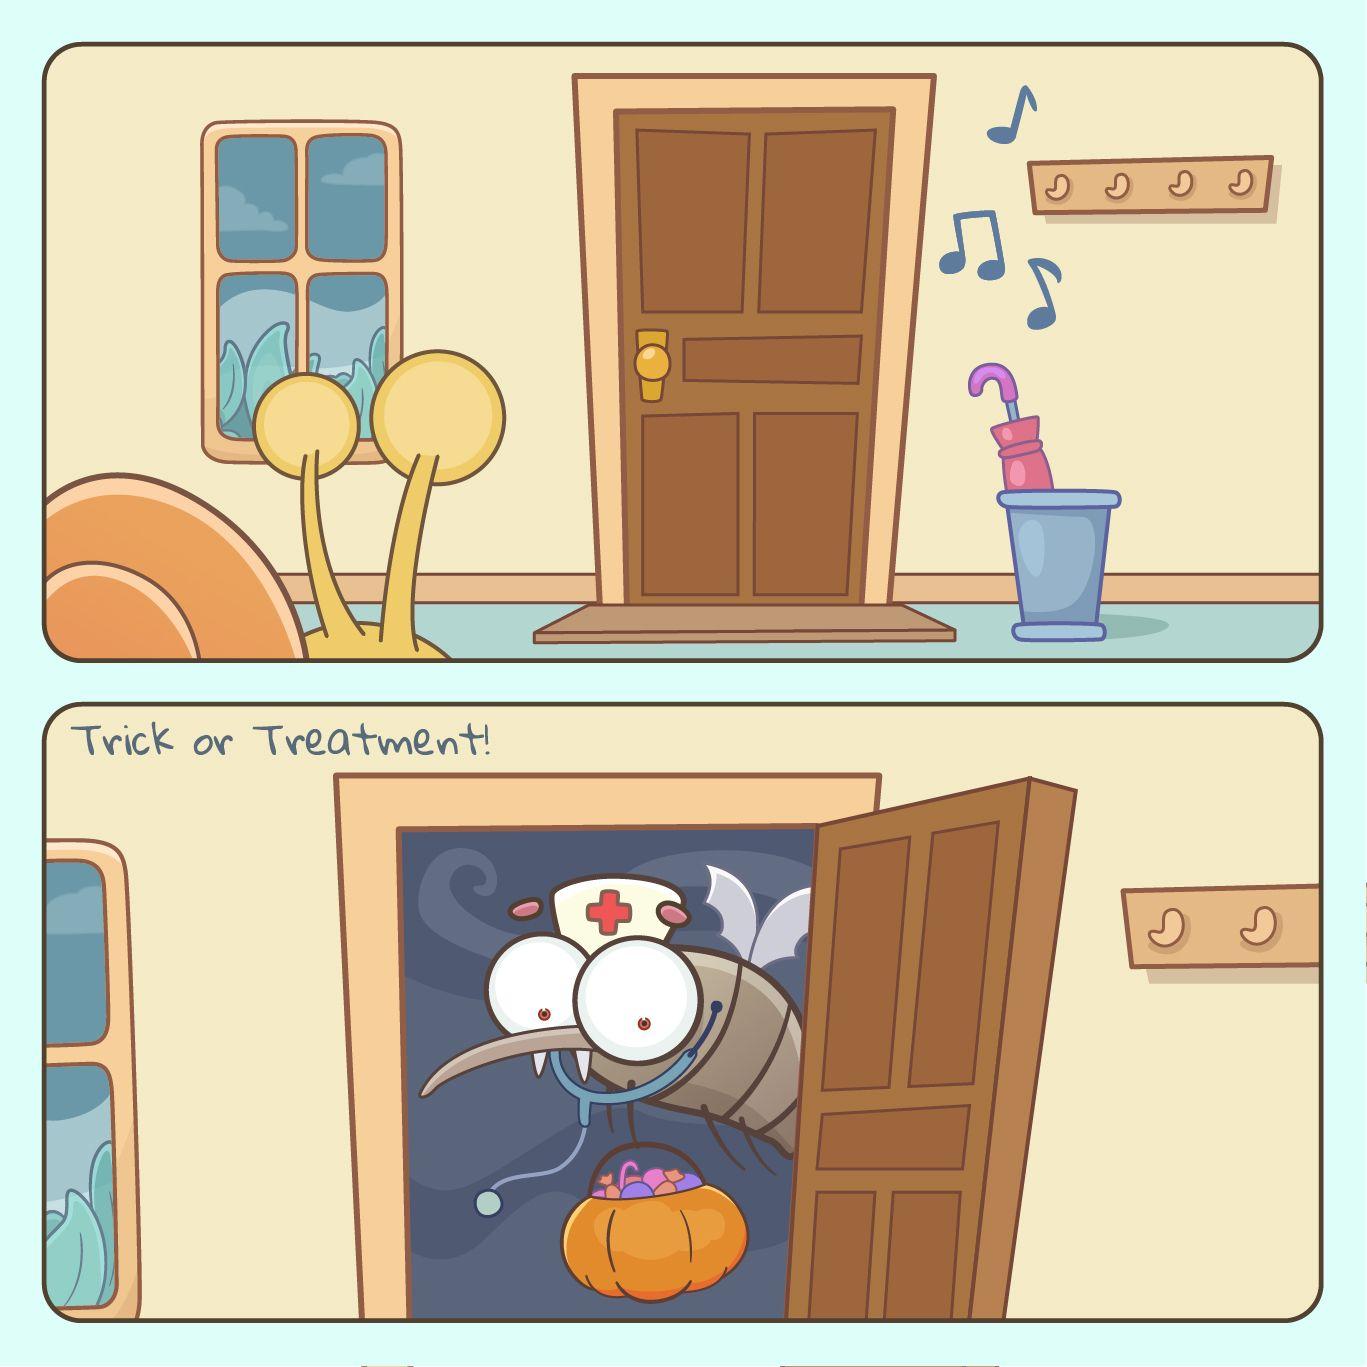 #trickortreatment #trickortreating #spooktacular #octoberfun #halloweencandy #ilovehalloween #vampirecostume #draculacostume #halloweencomic #halloweencomics #halloweenlooks #halloweeninspo #spookyseason #halloweenlife #falldecorating #shortcomic #comicstrip #halloweeneve #thisishalloween #candycorn